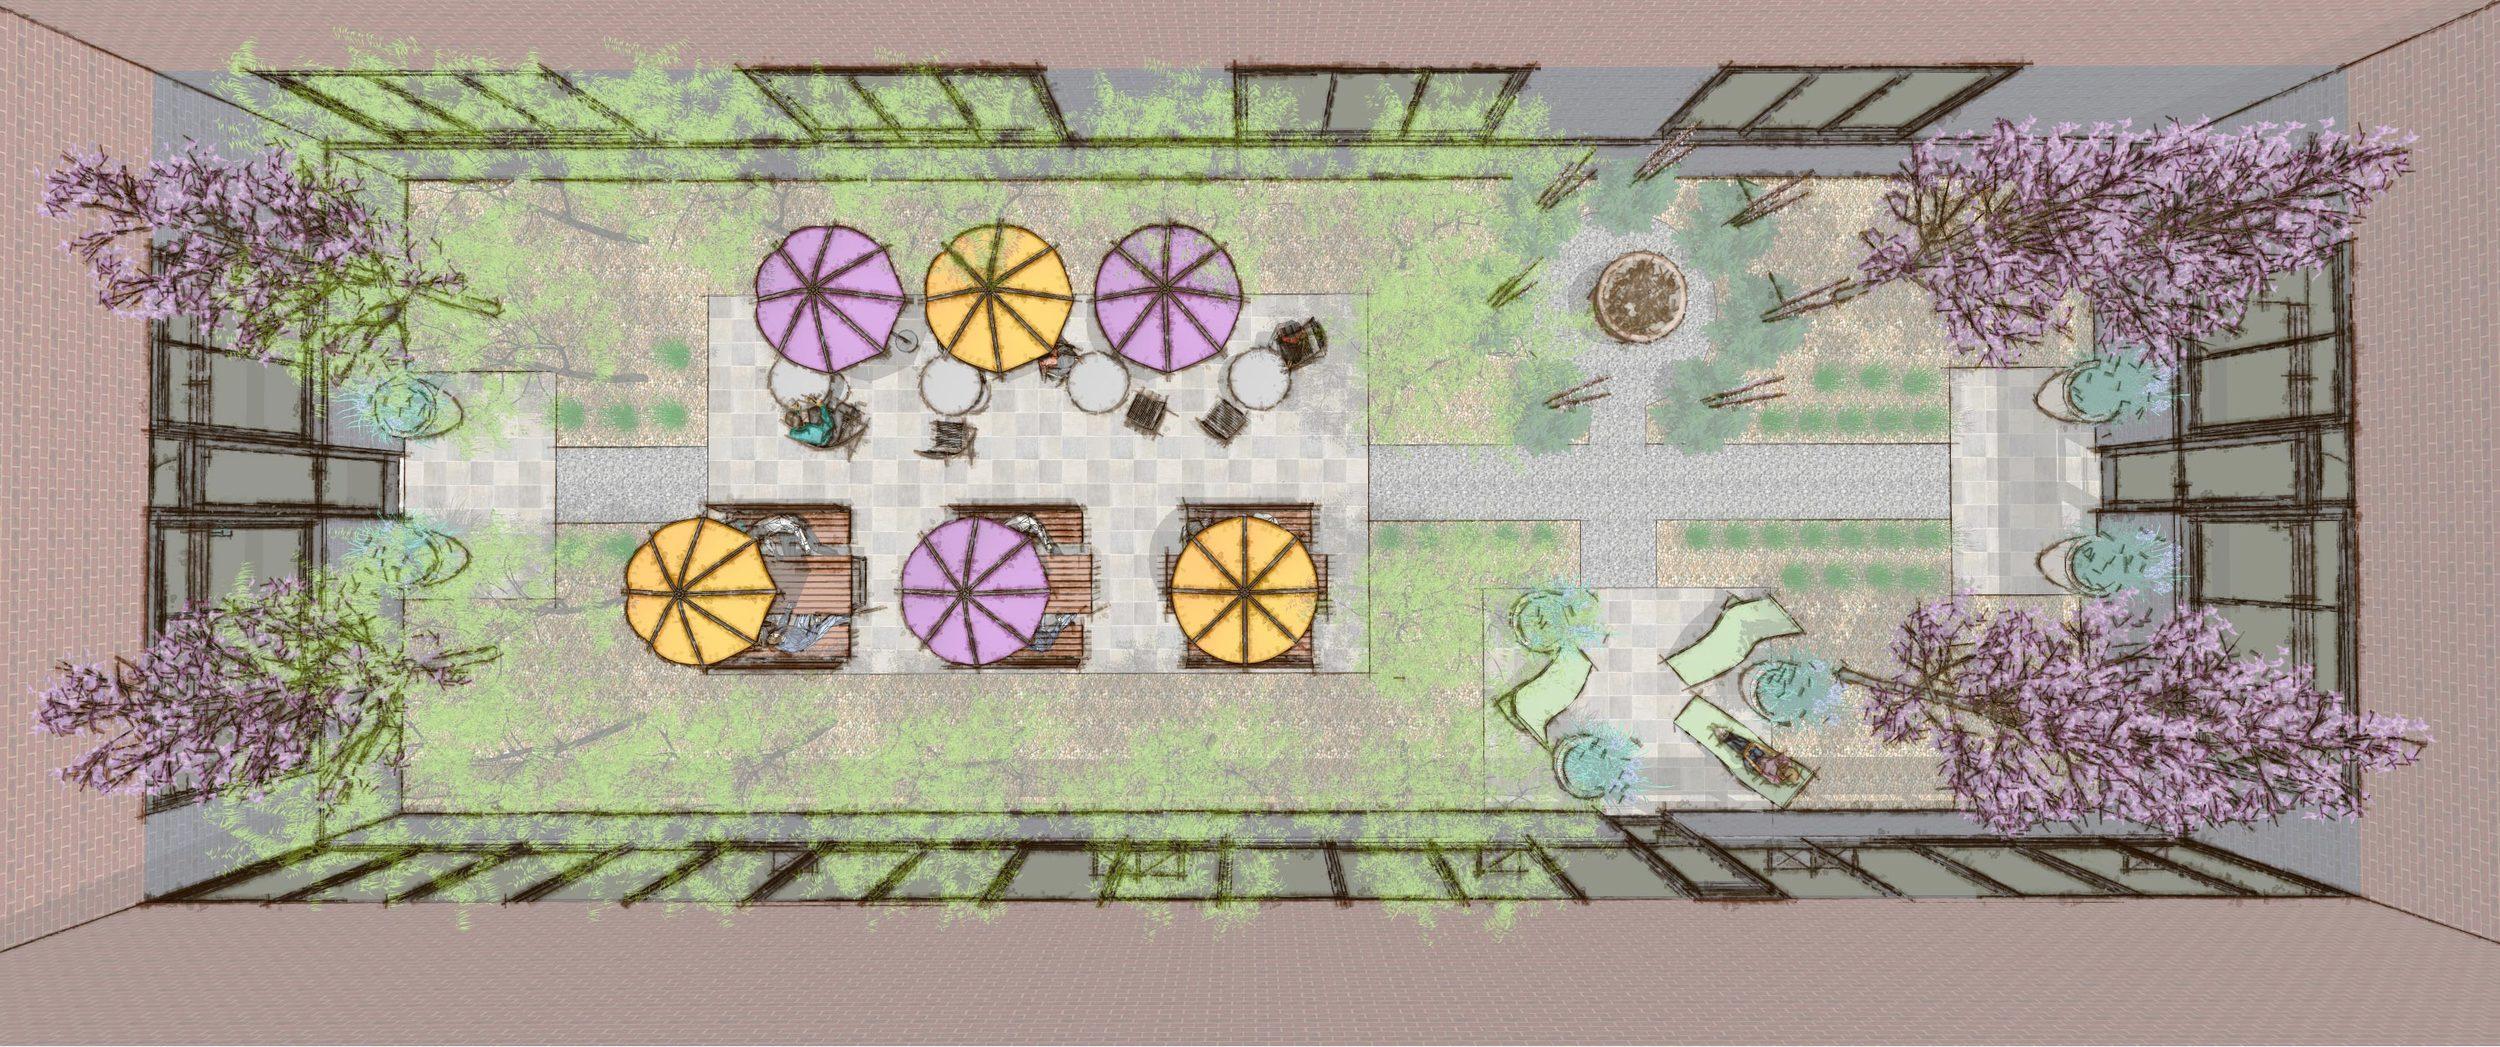 Zoetis-courtyard_Alt2_plan_sketchy.jpg